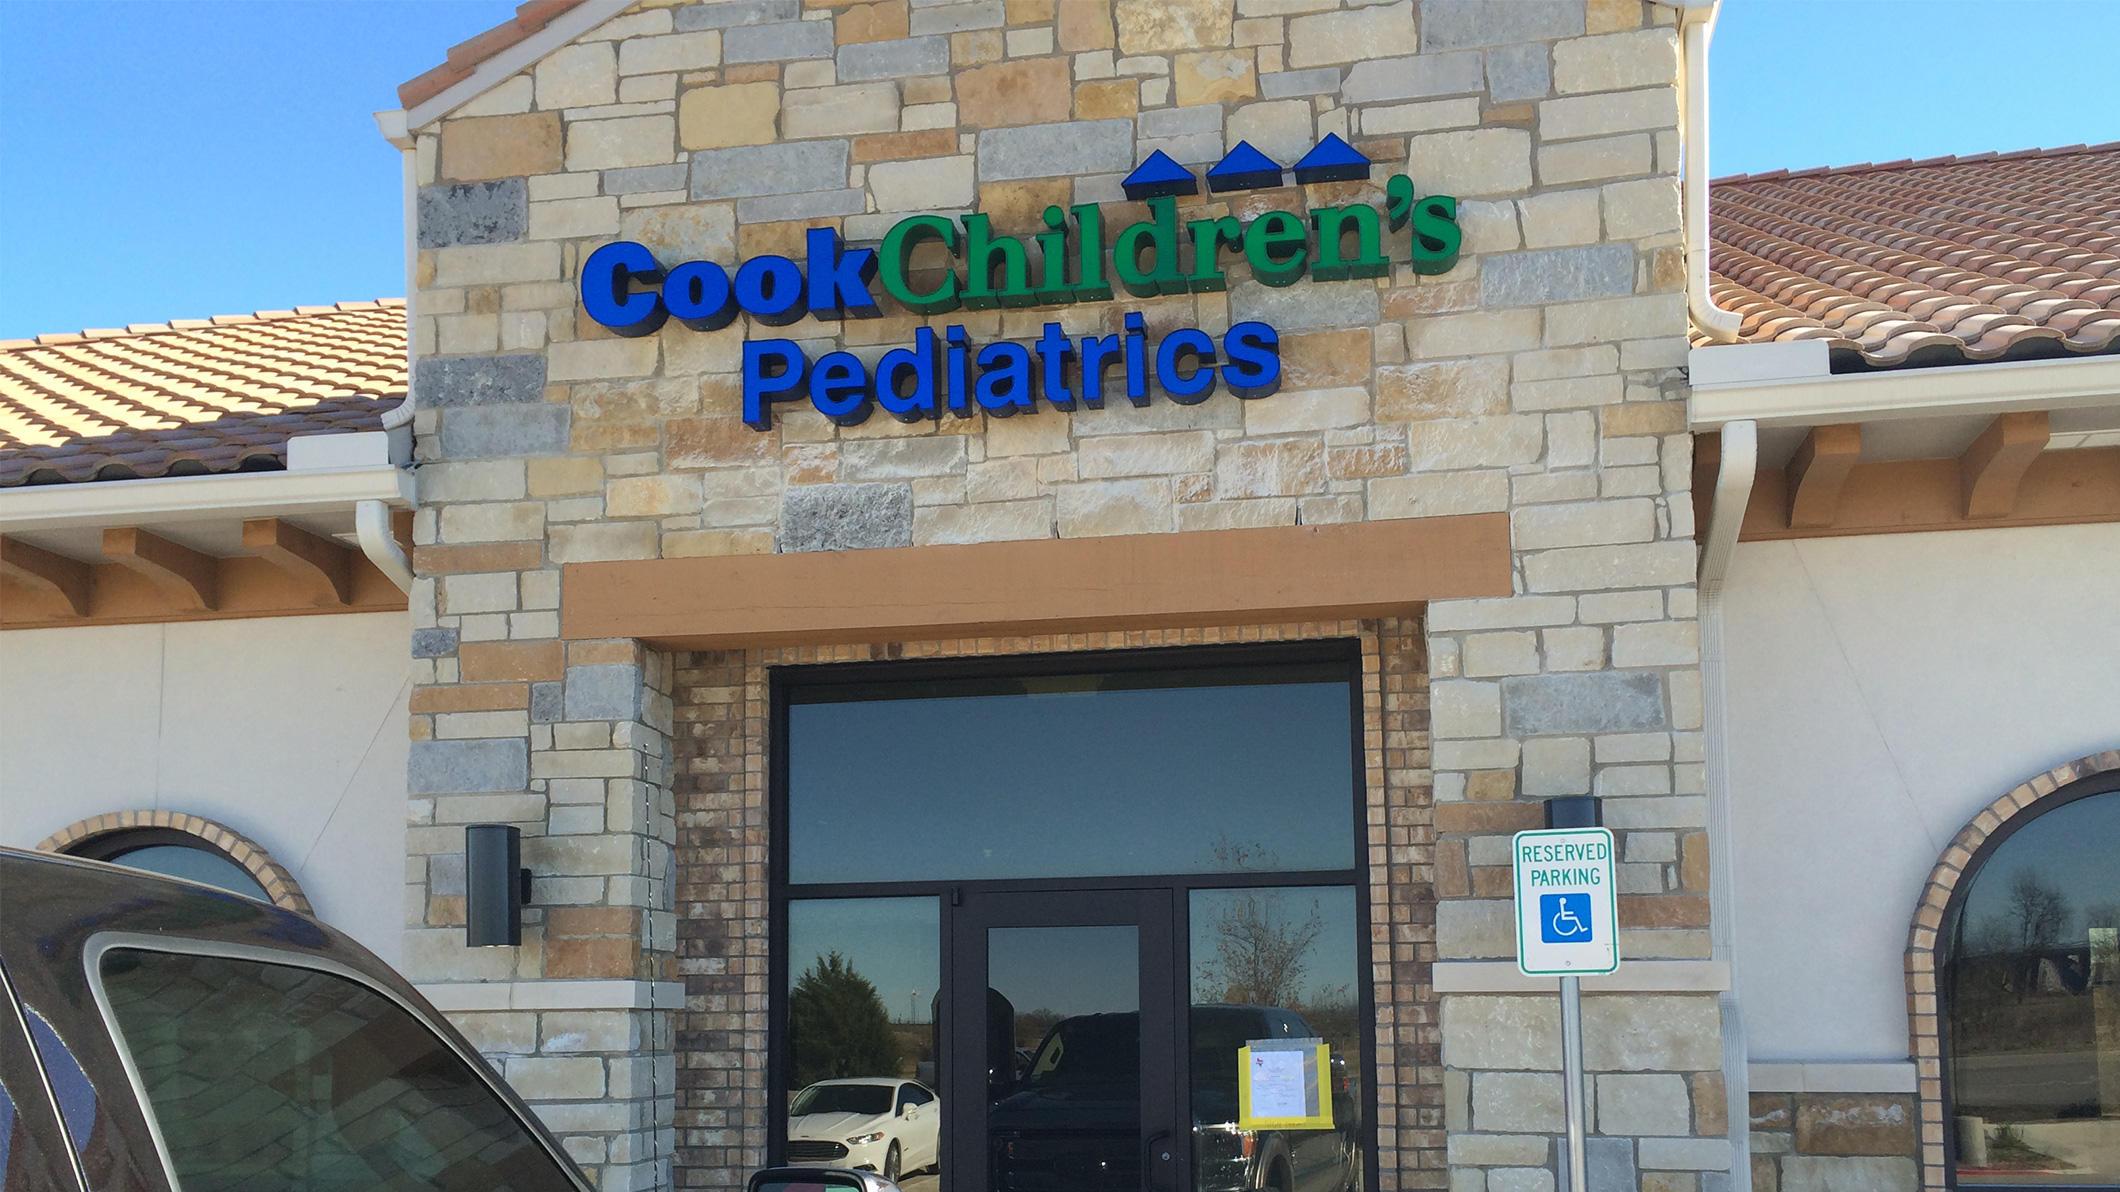 Cook Children's Pediatrics Haslet image 1